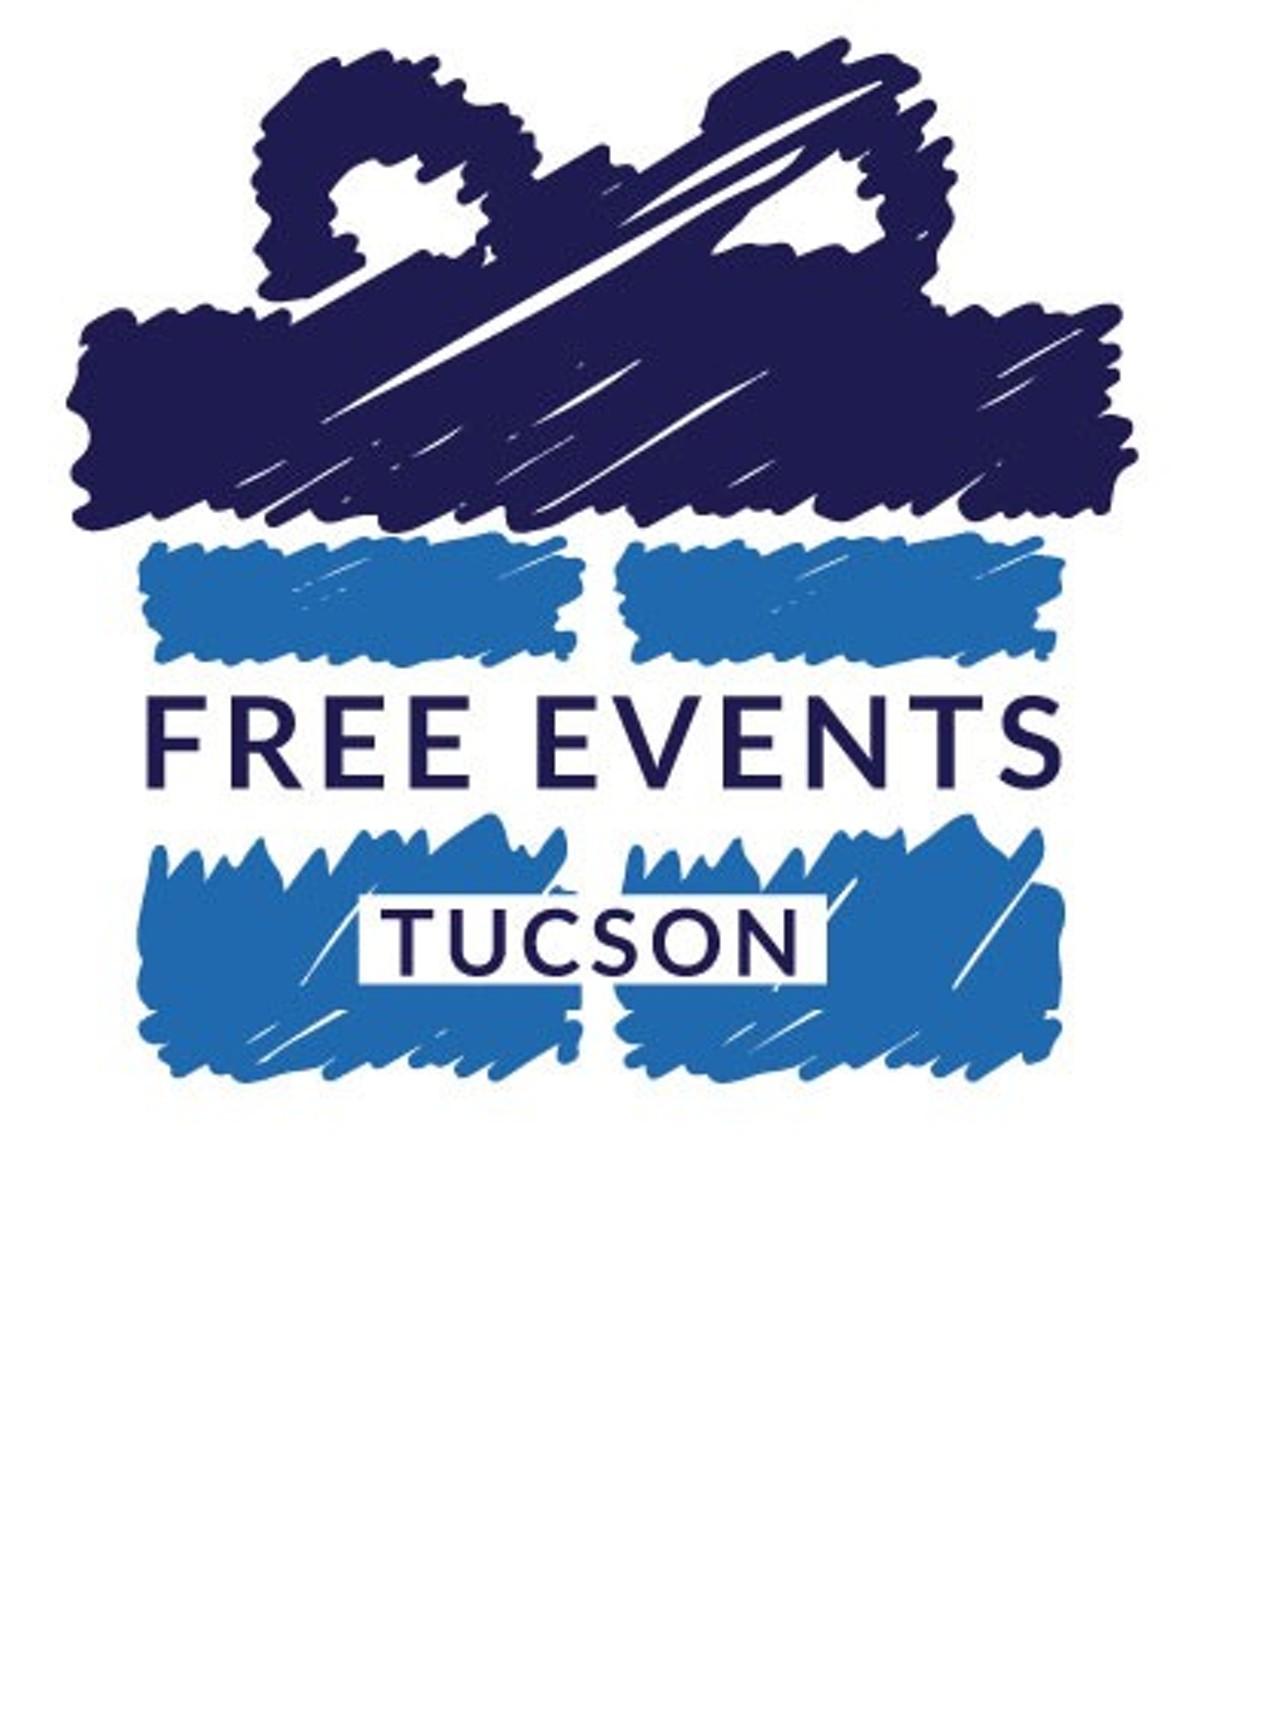 Two-person Tai Chi | The DoJo | Health | Tucson Weekly